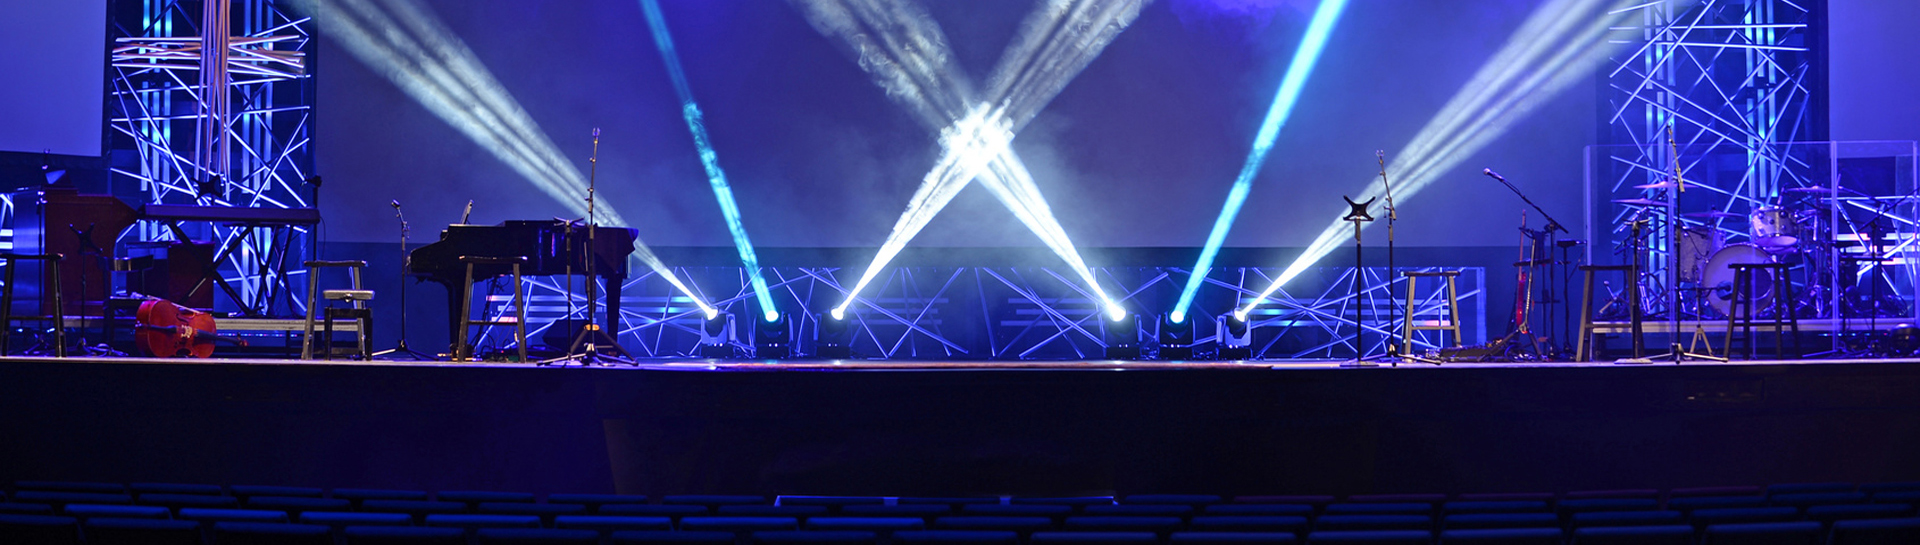 Referenzen-Liveband